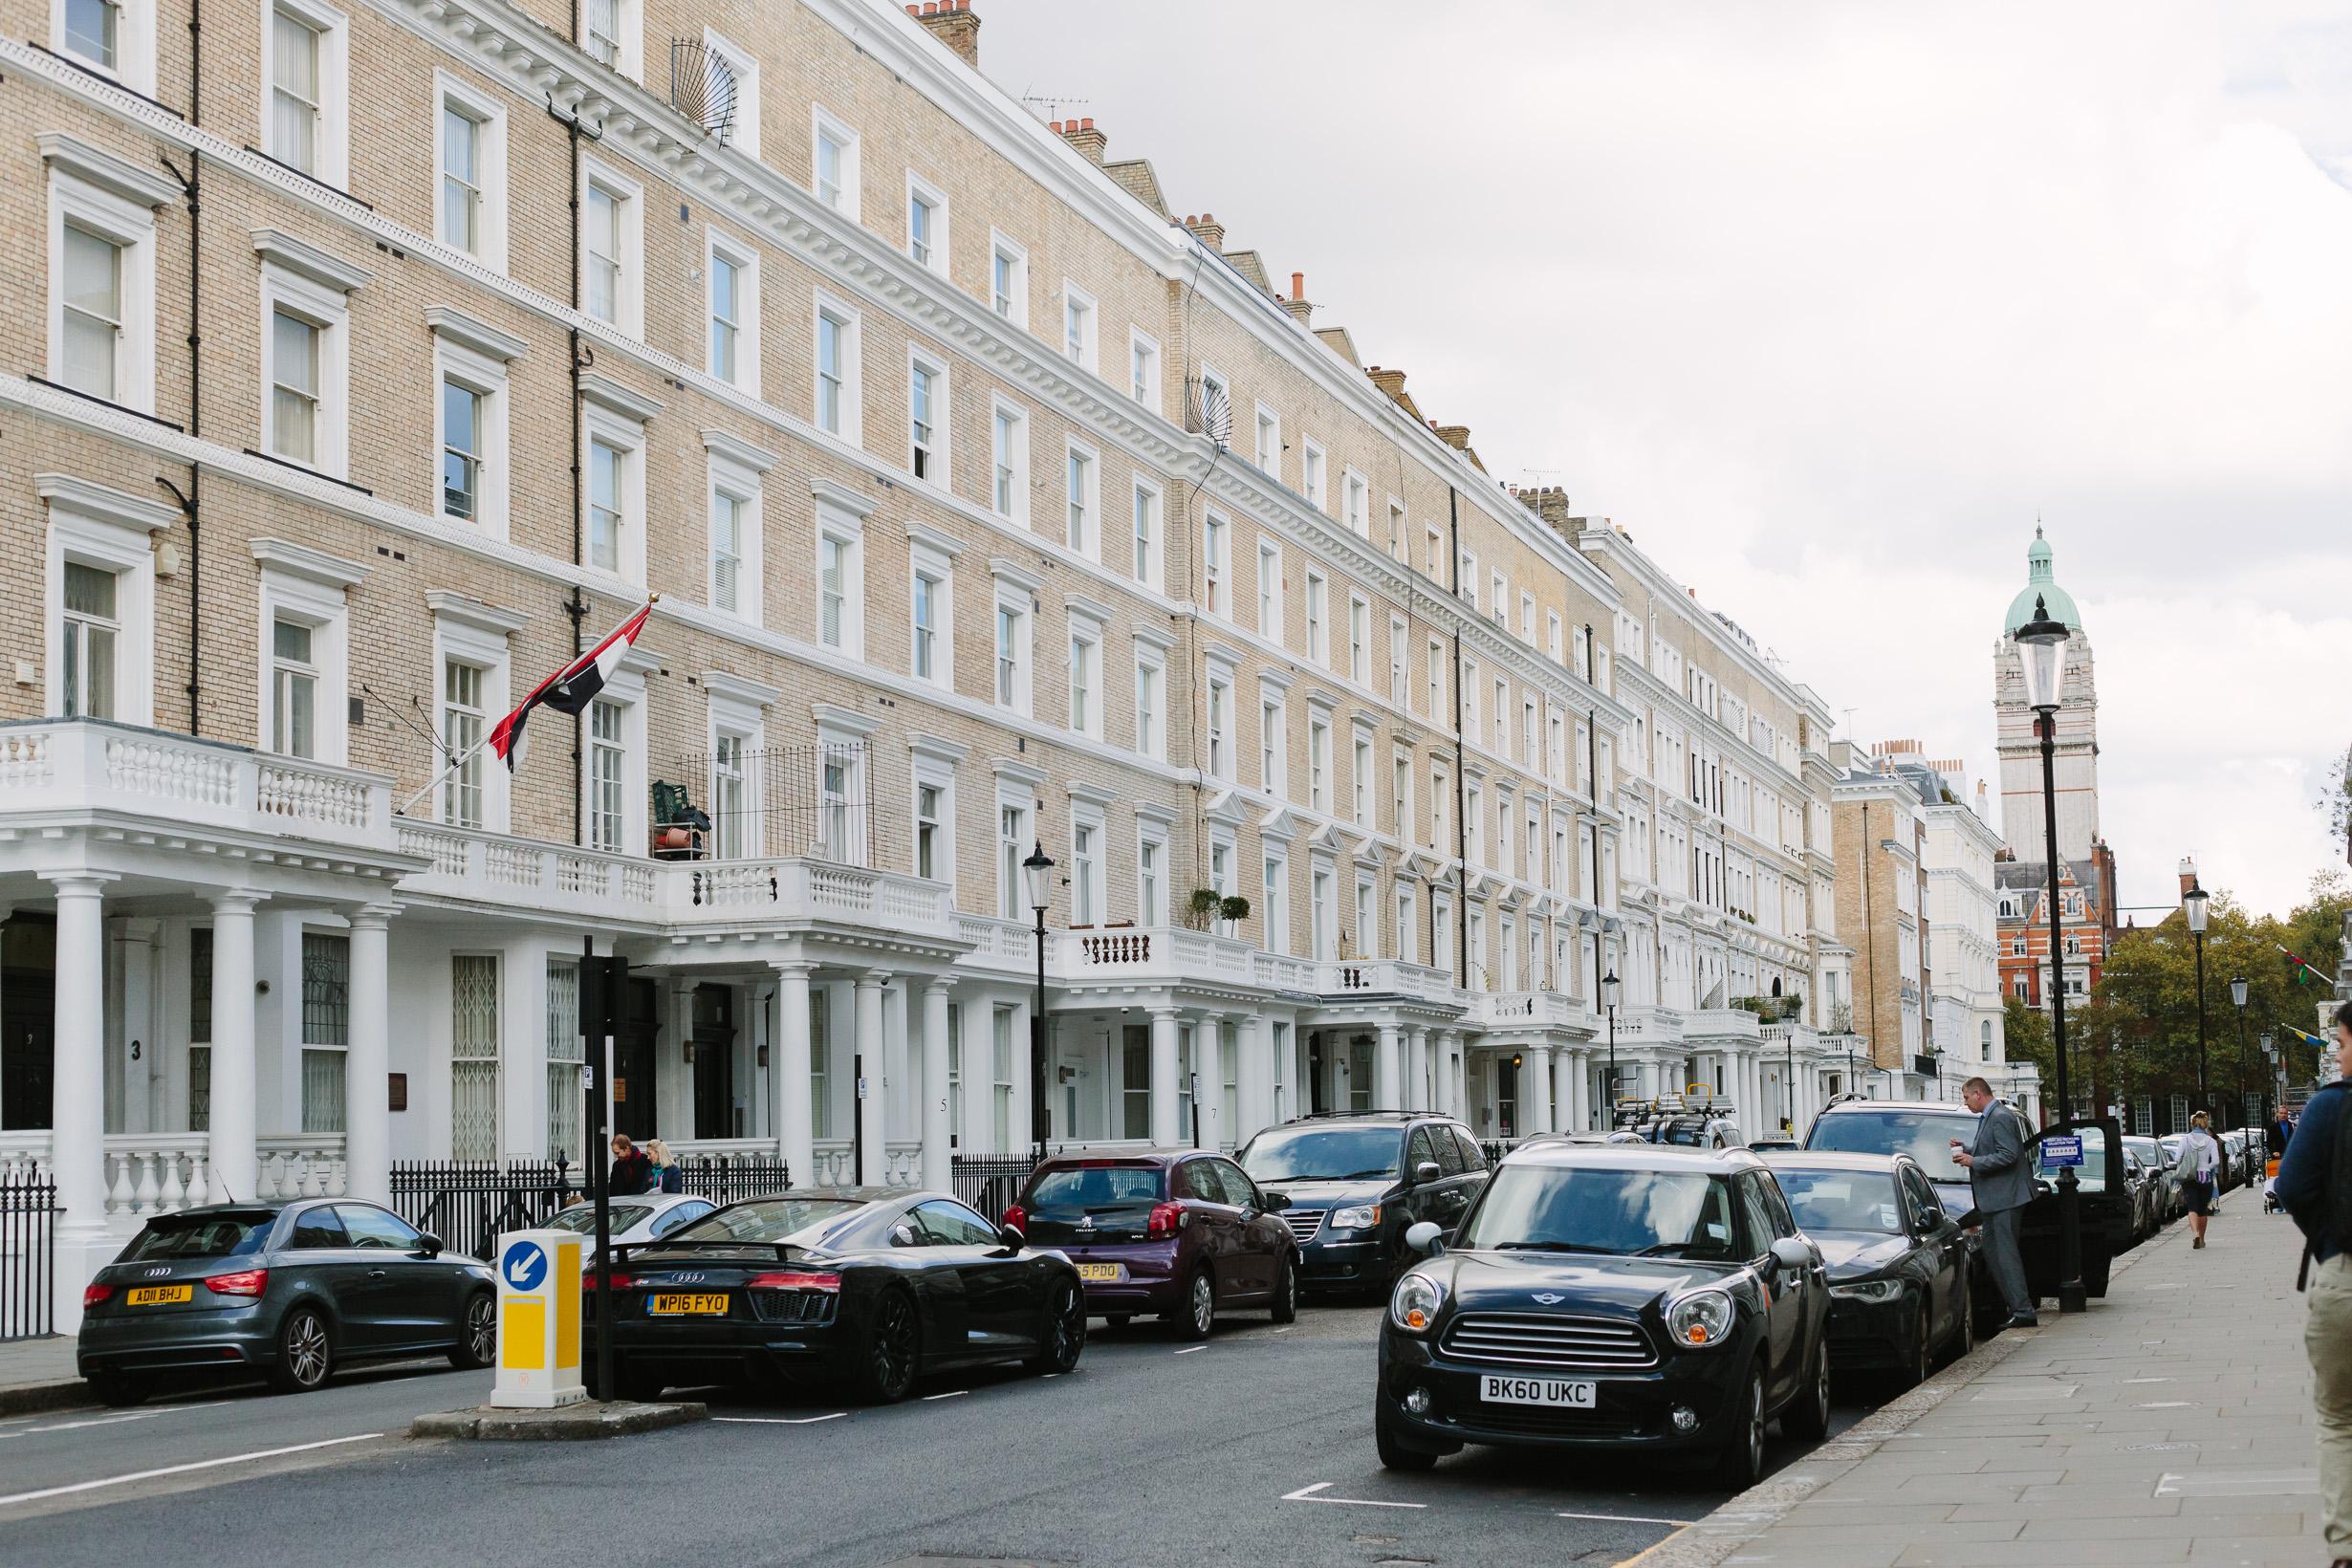 Borough royal de Kensington & Chelsea